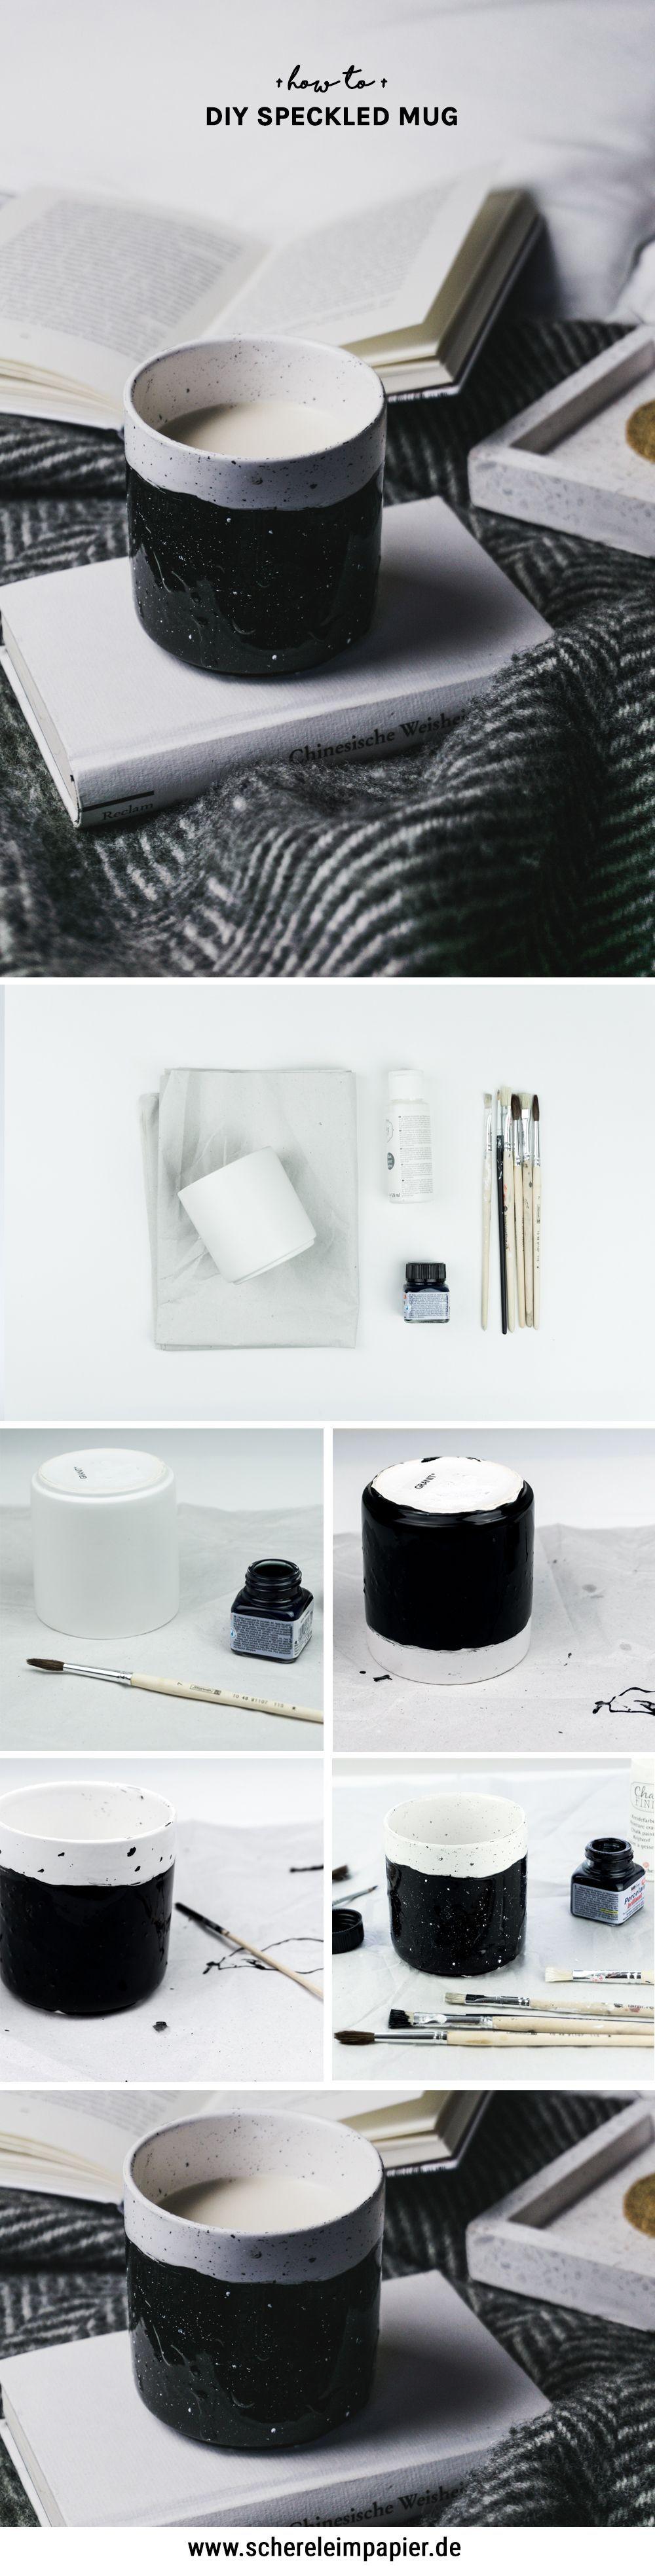 Keramik Bemalen Diy B W Speckled Cup Design Schereleimpapier Diy Keramik Bemalen Diy Design Tassen Design